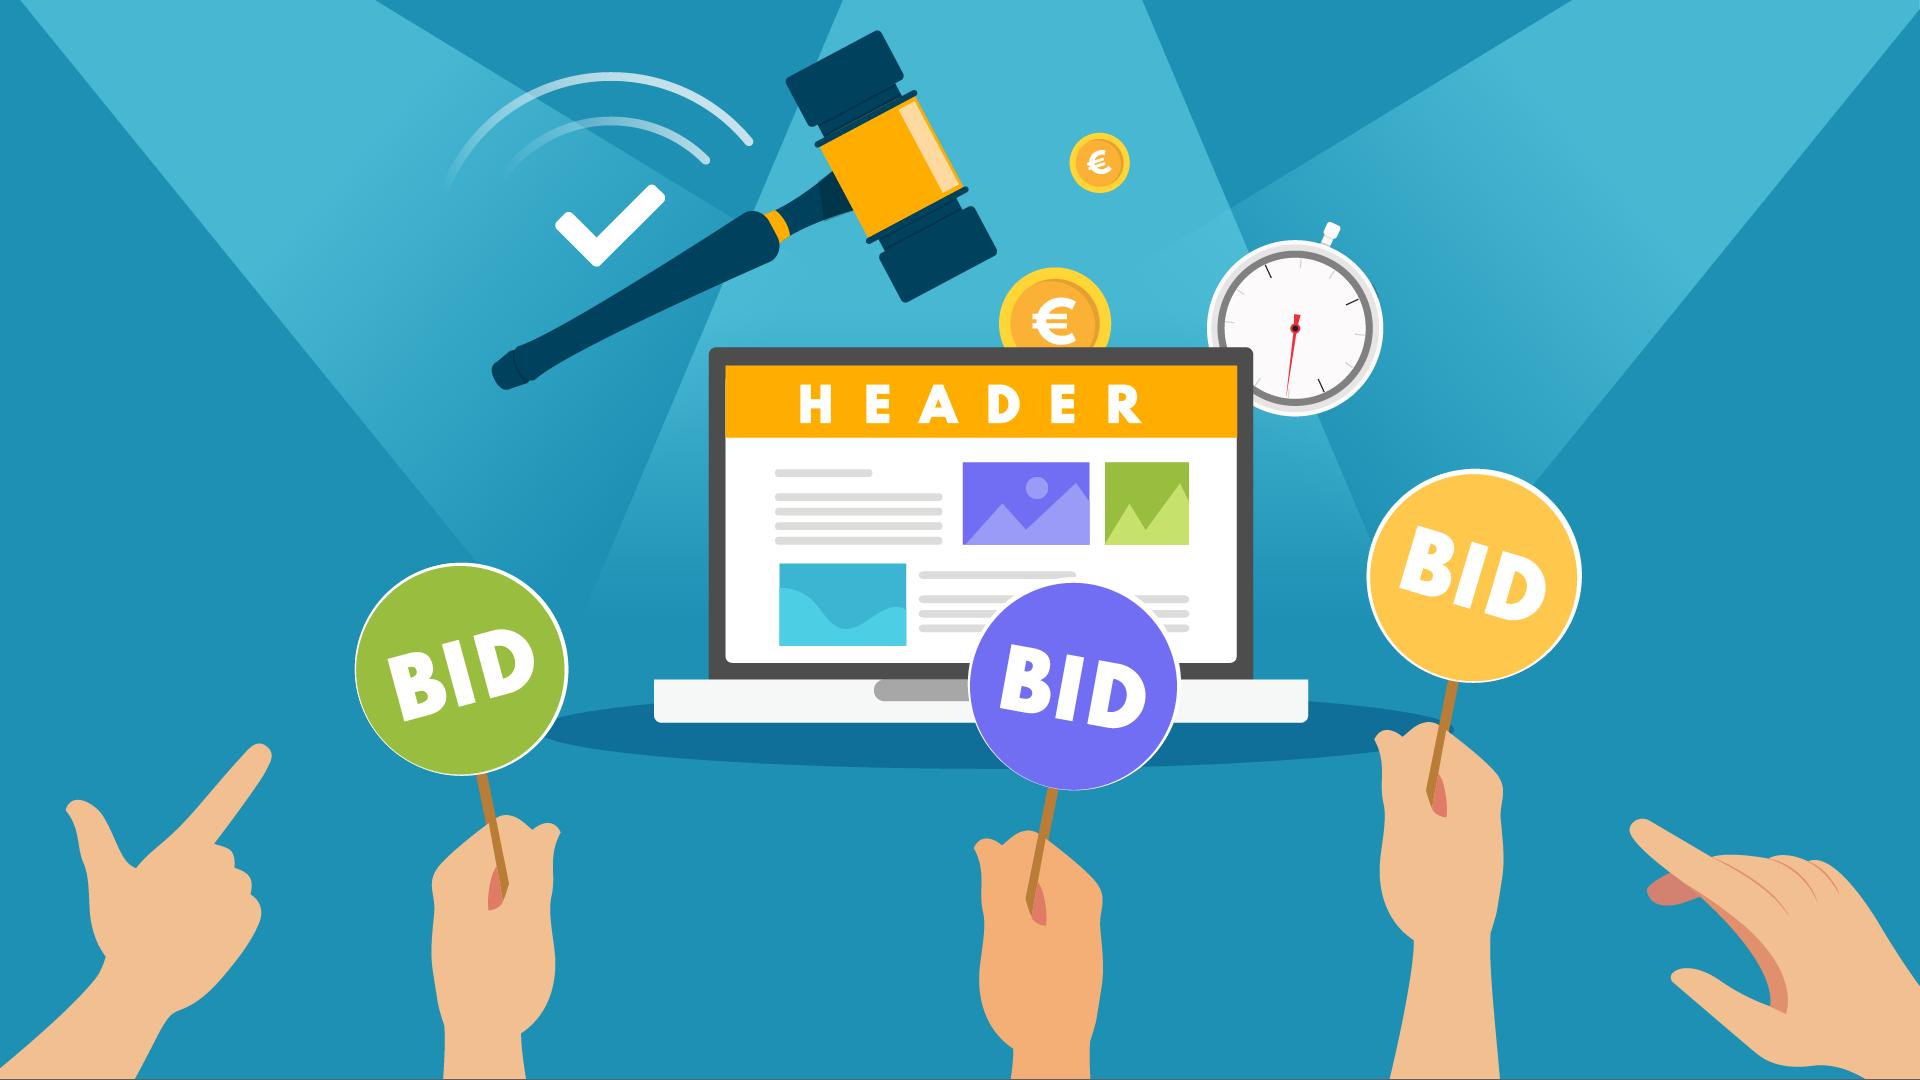 Illustration Glossaire - Header bidding